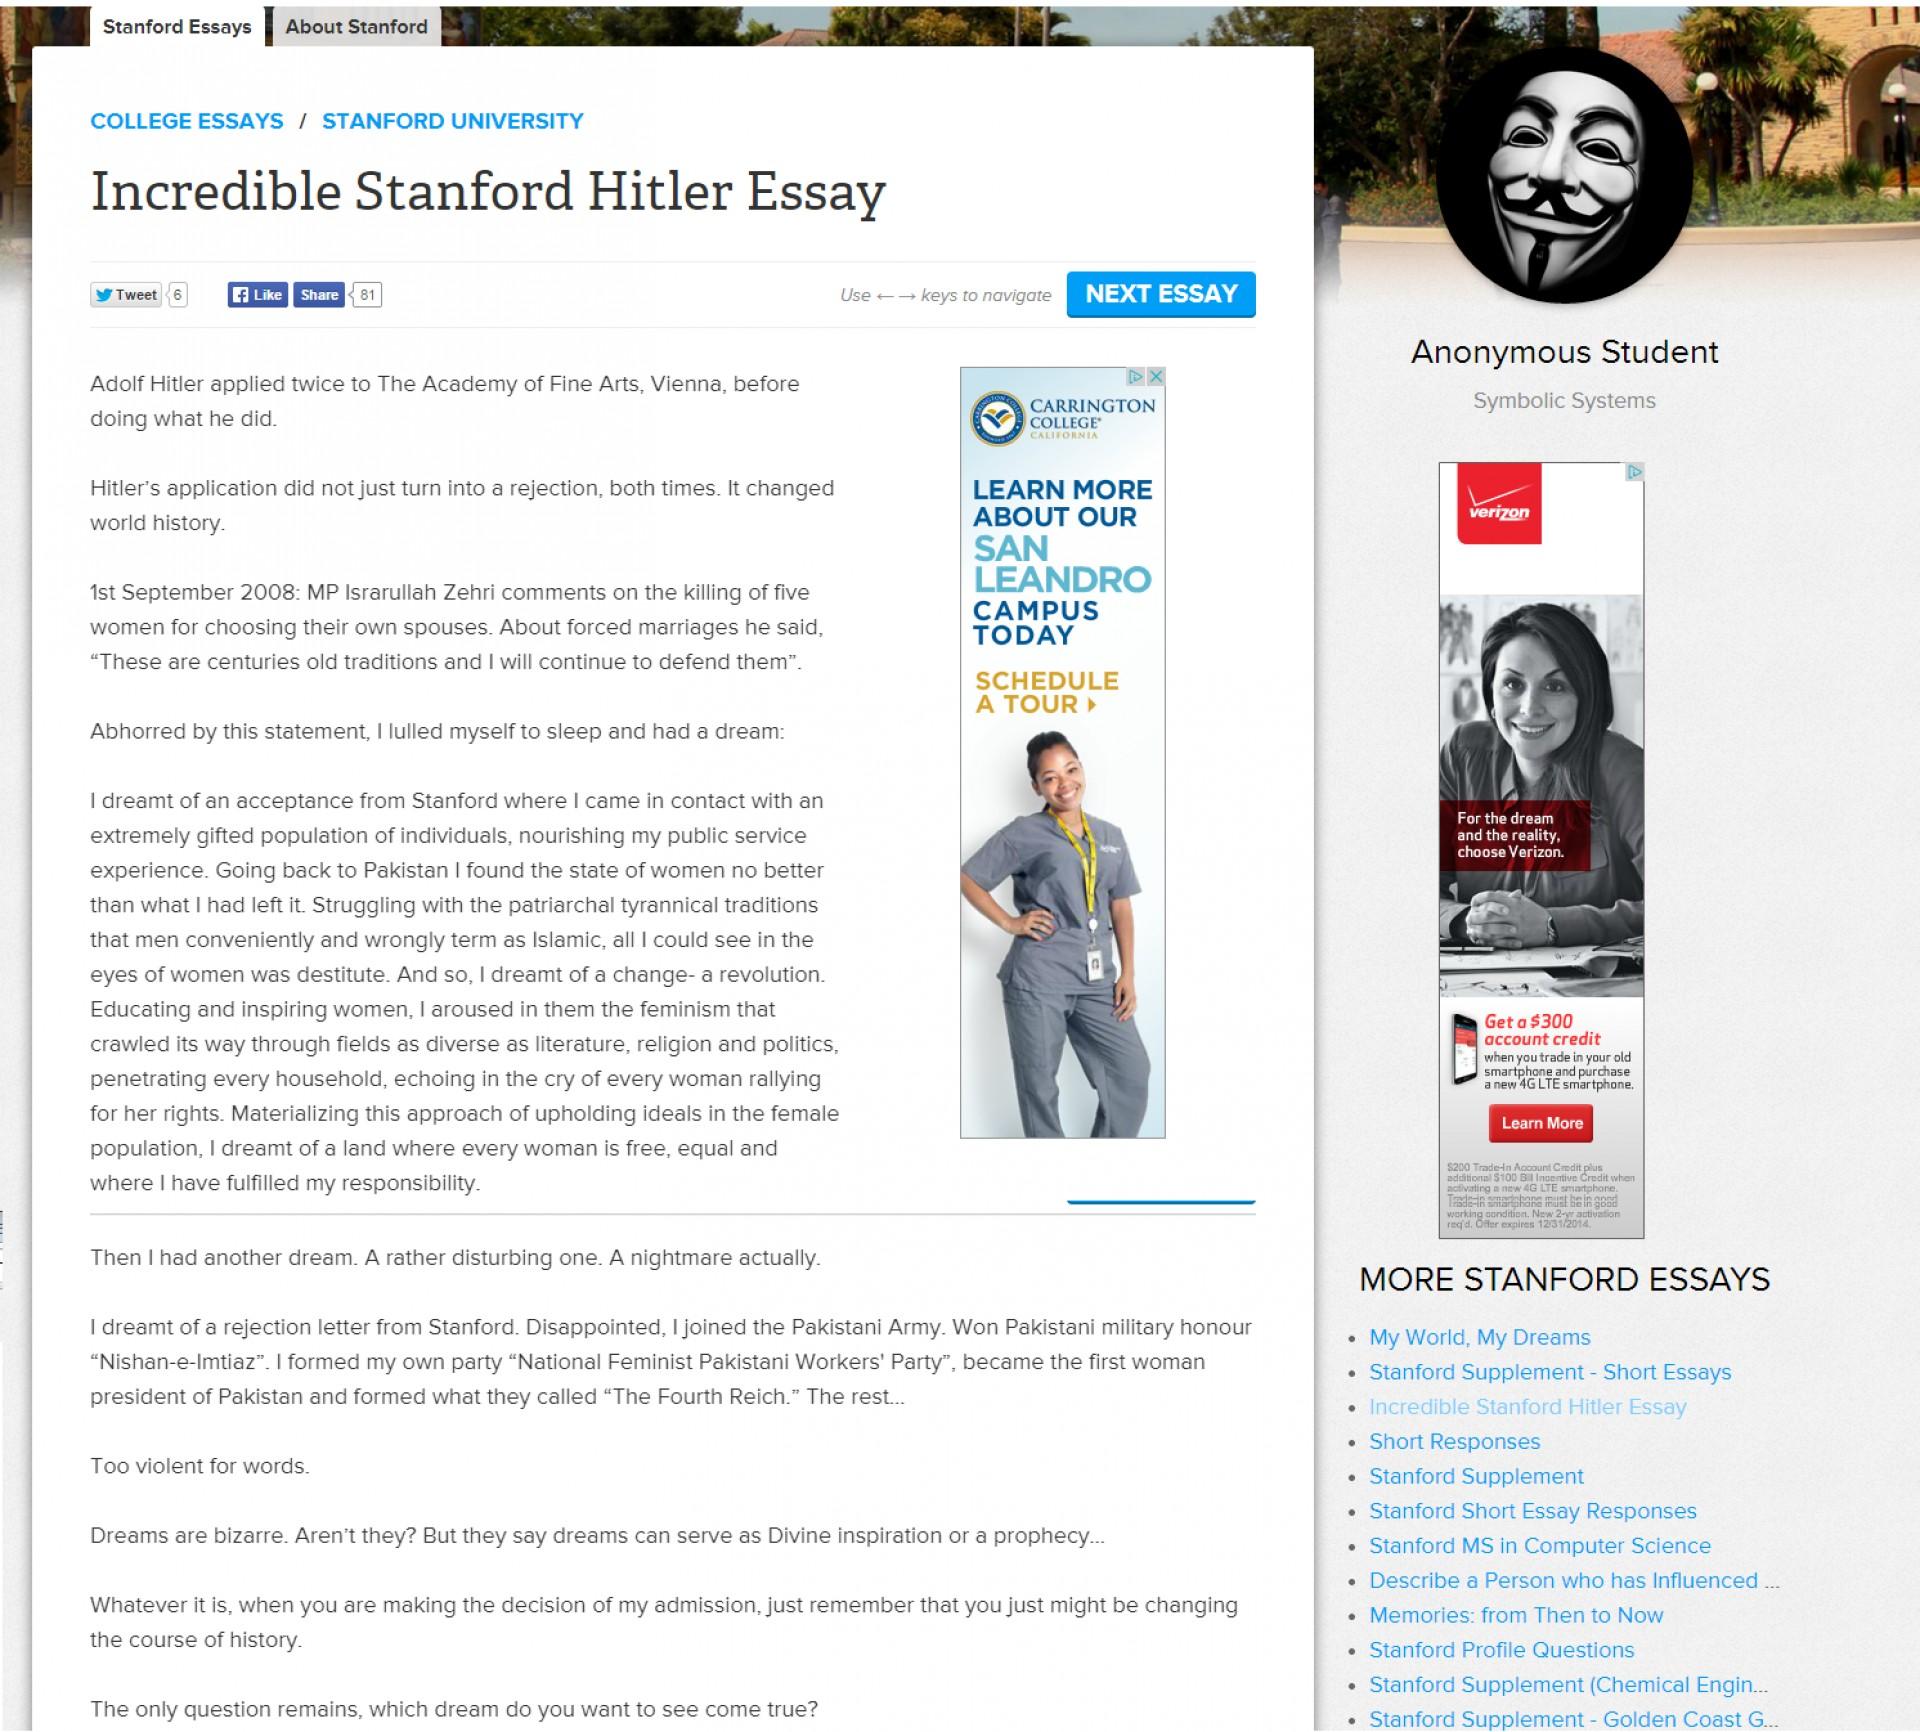 011 Essay Reworder Example Thebestcollegeessaywaslookingforessaystobase 195e1b 5381618 Magnificent Best Rewriter Software Free Download App 1920